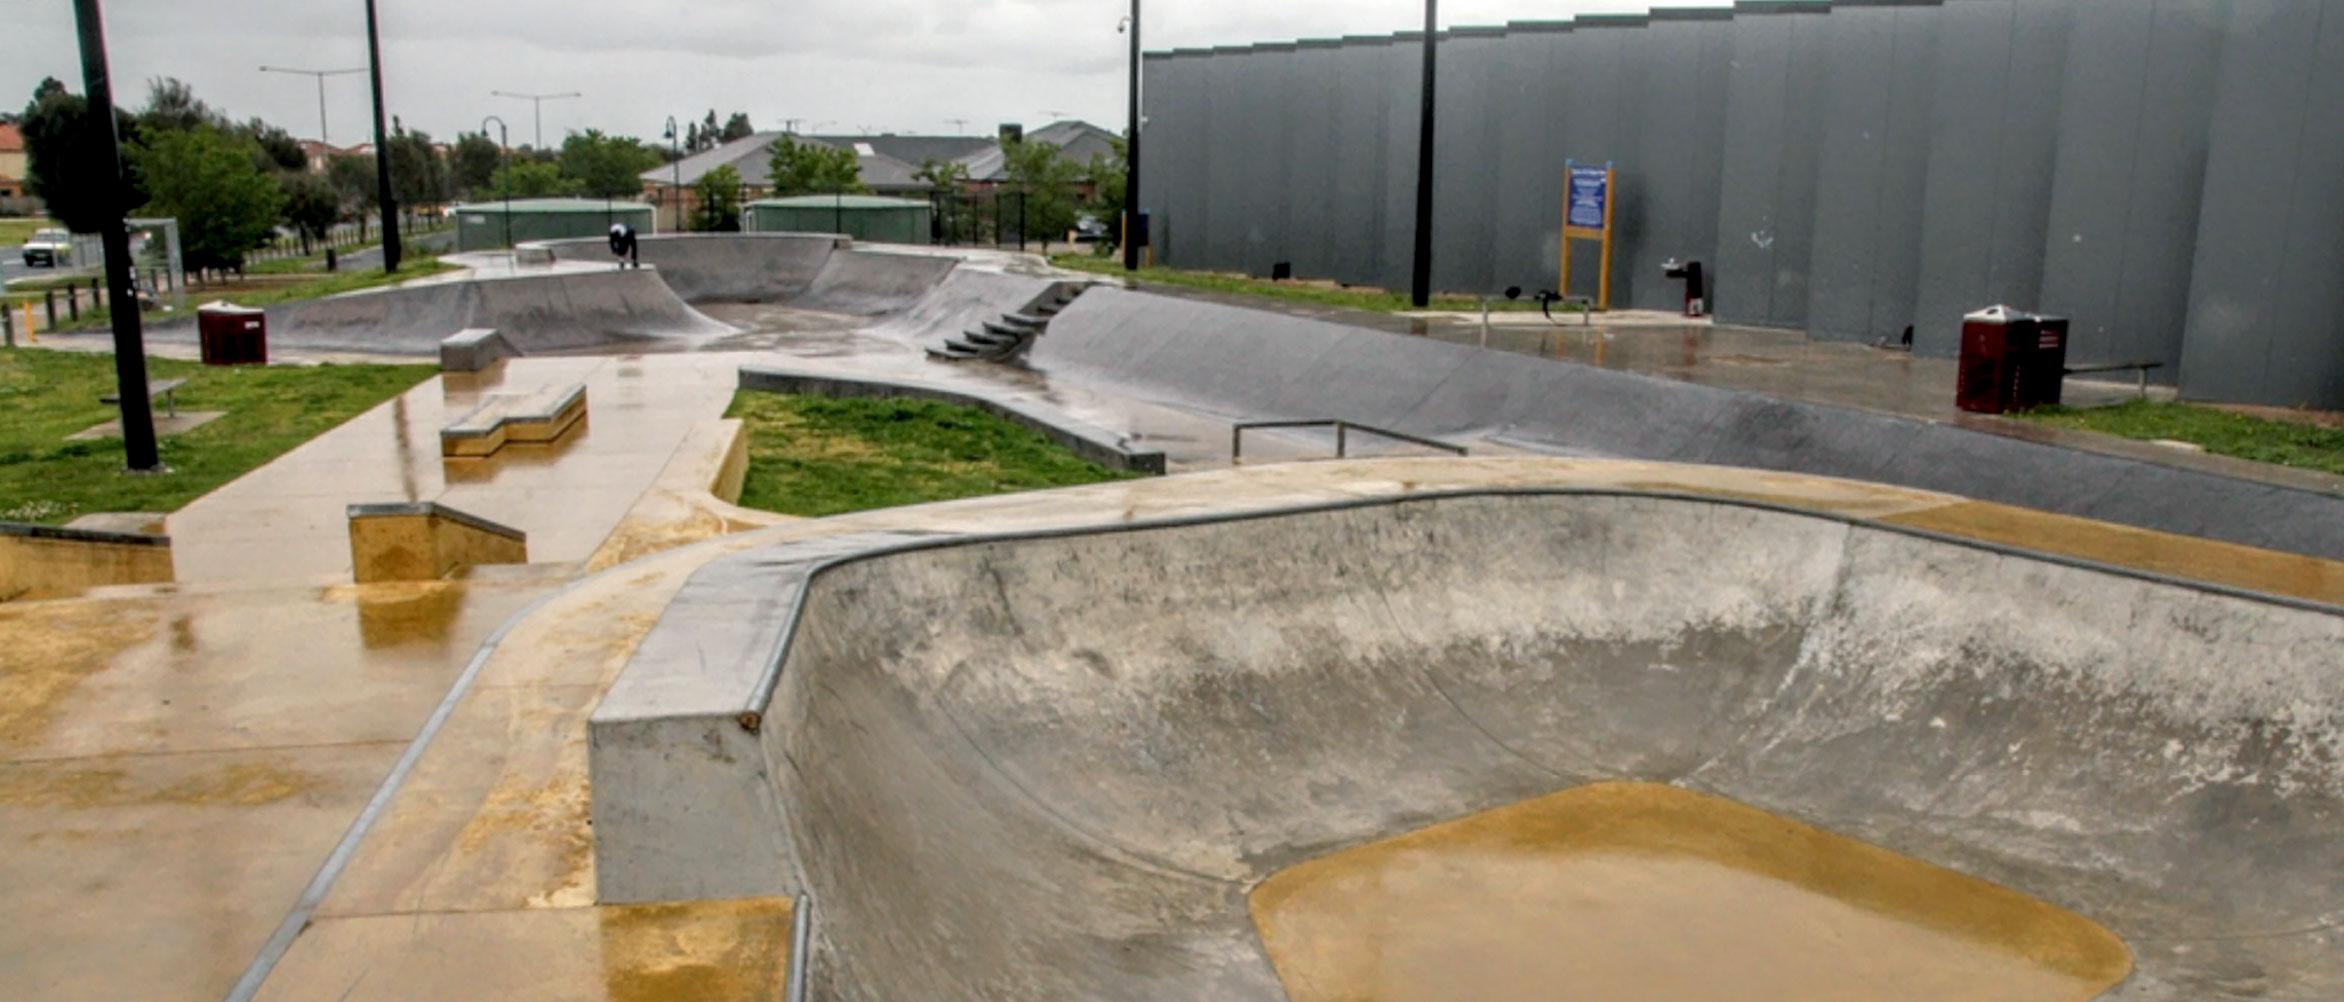 Taylors Hill skate bowl, Concrete Skateparks